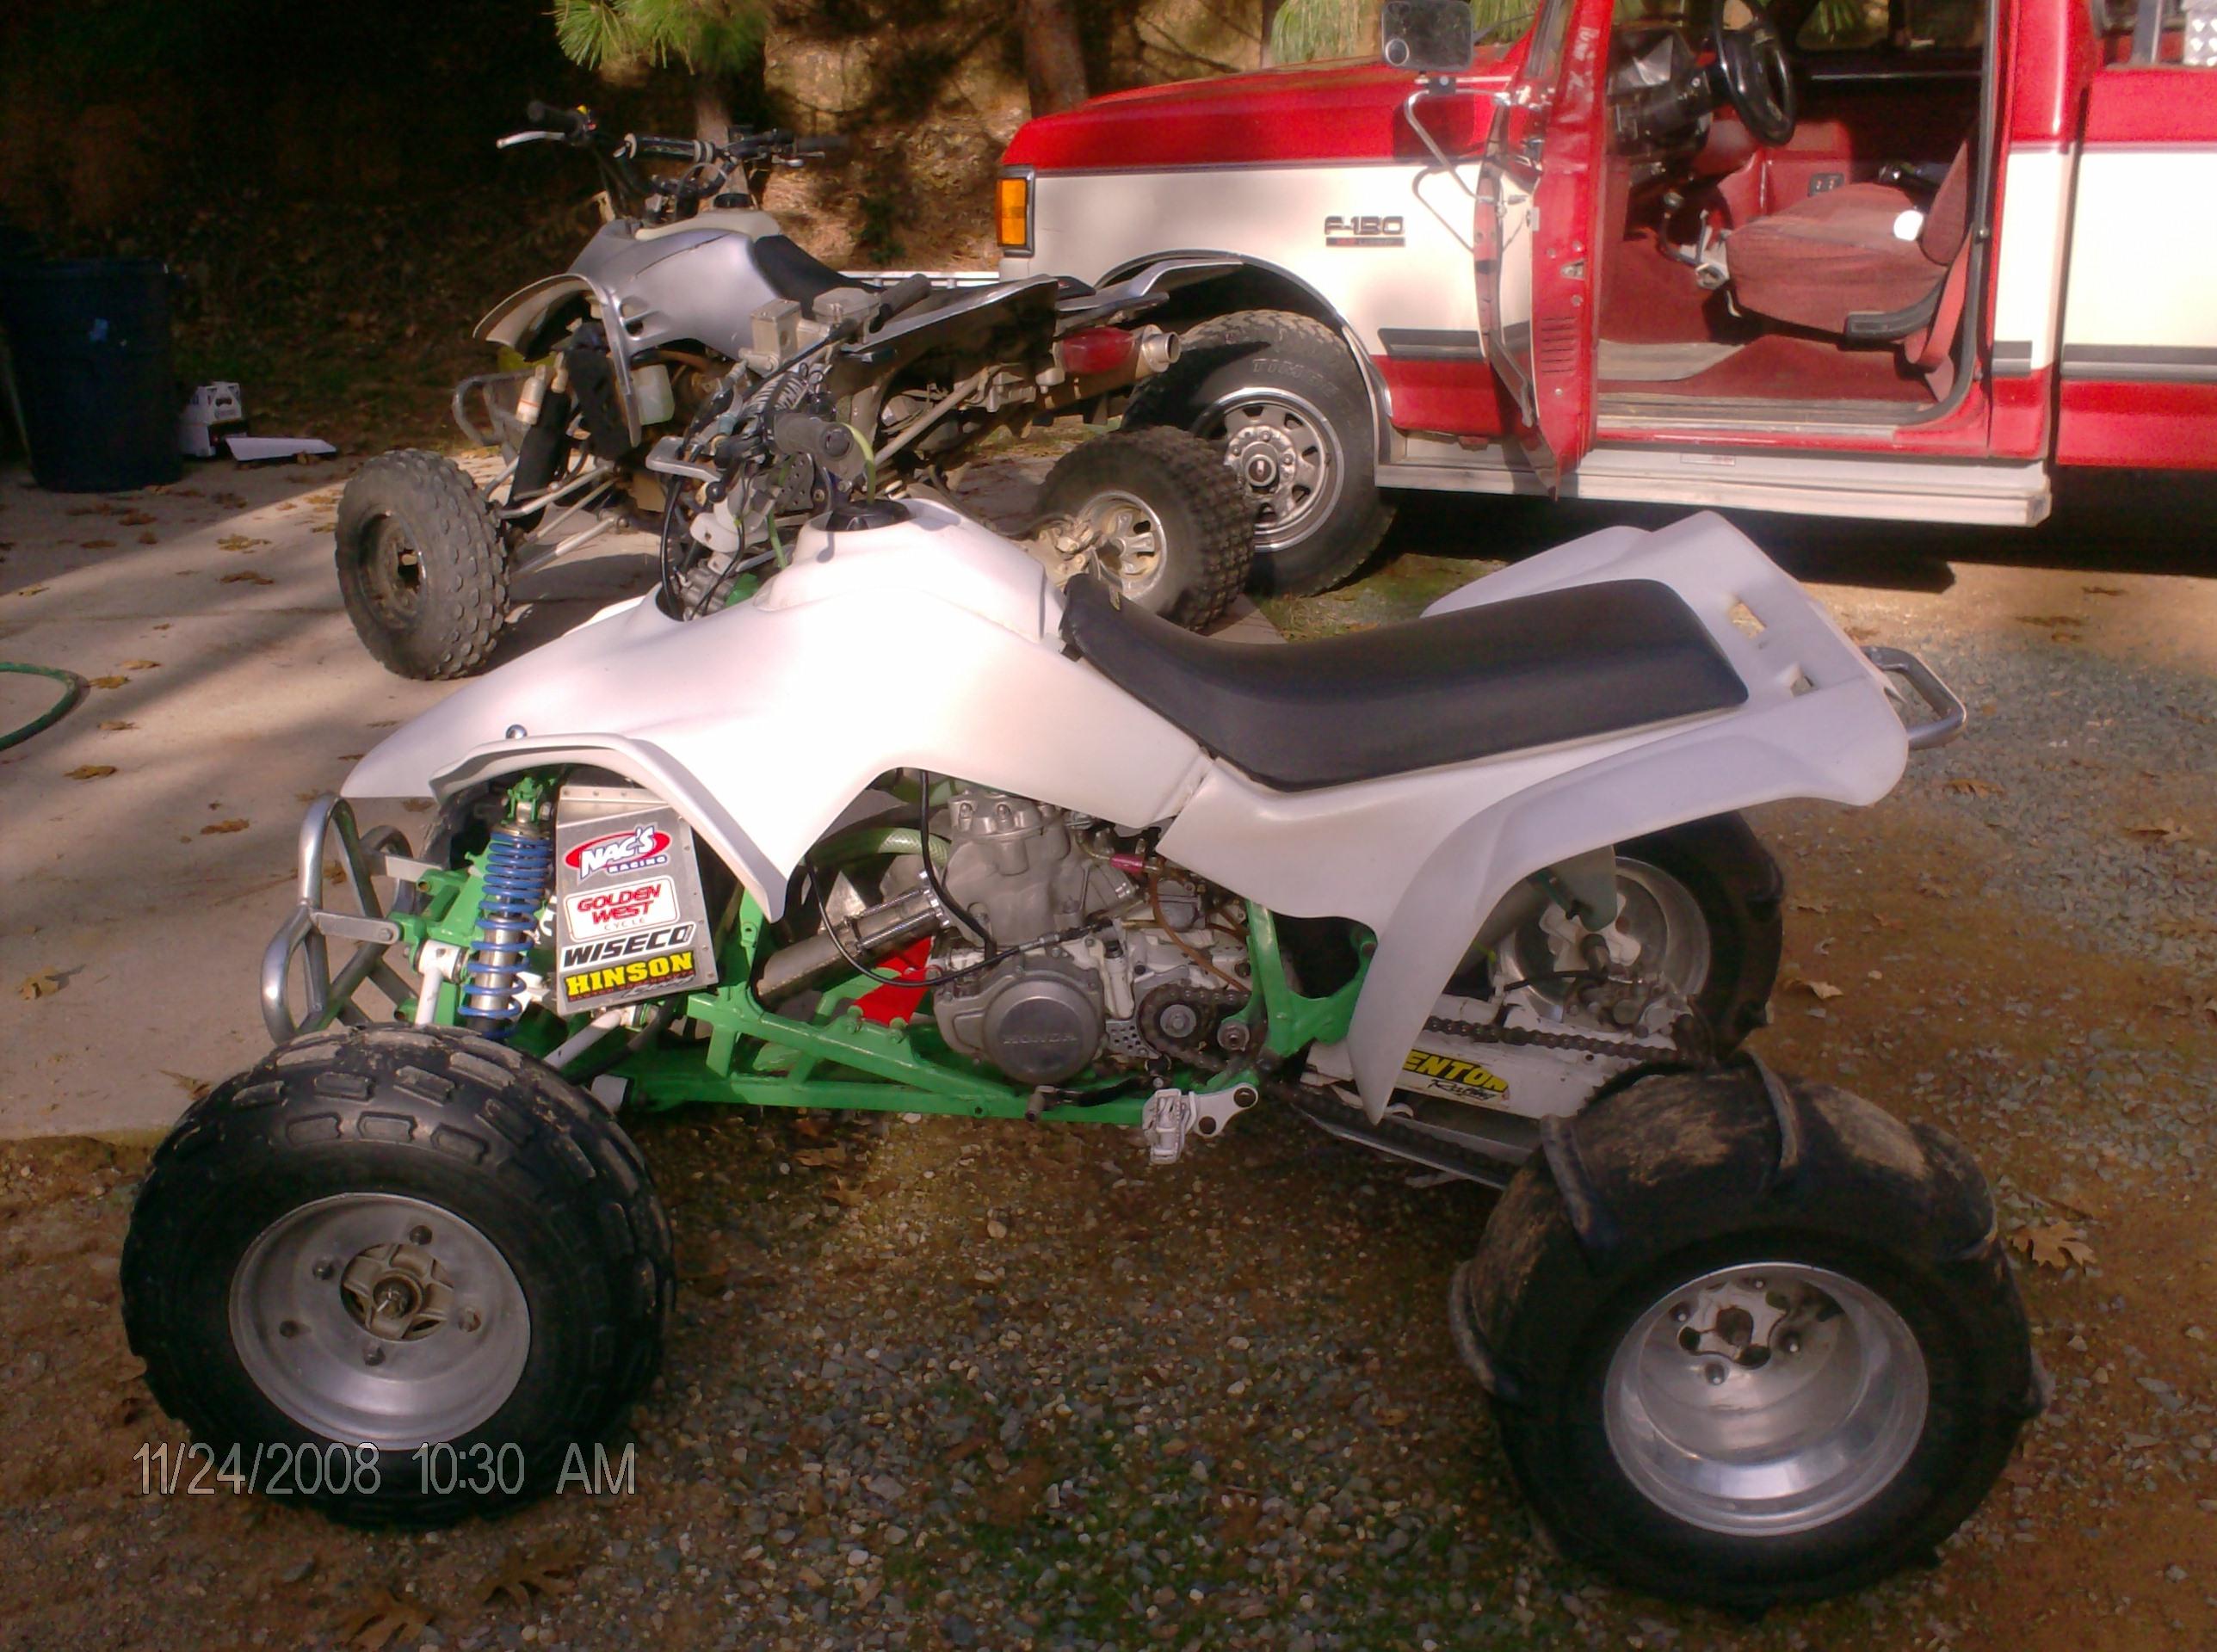 ... ::: > For sale forum > Complete Quads F/S > 86 Honda Trx 250r